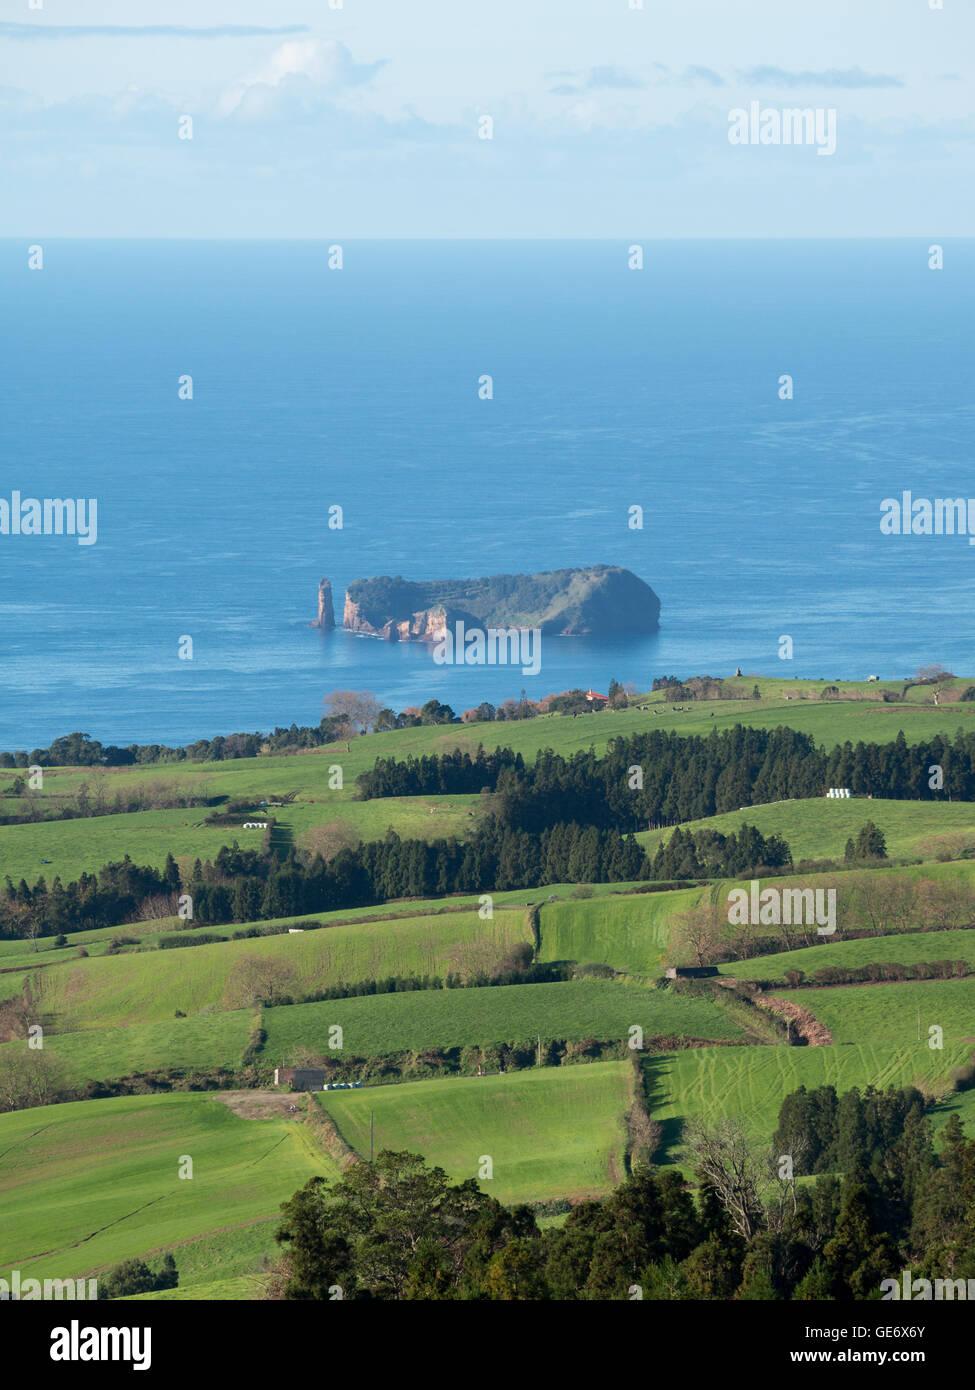 Vola Franca islet by São Miguel green landscape - Stock Image